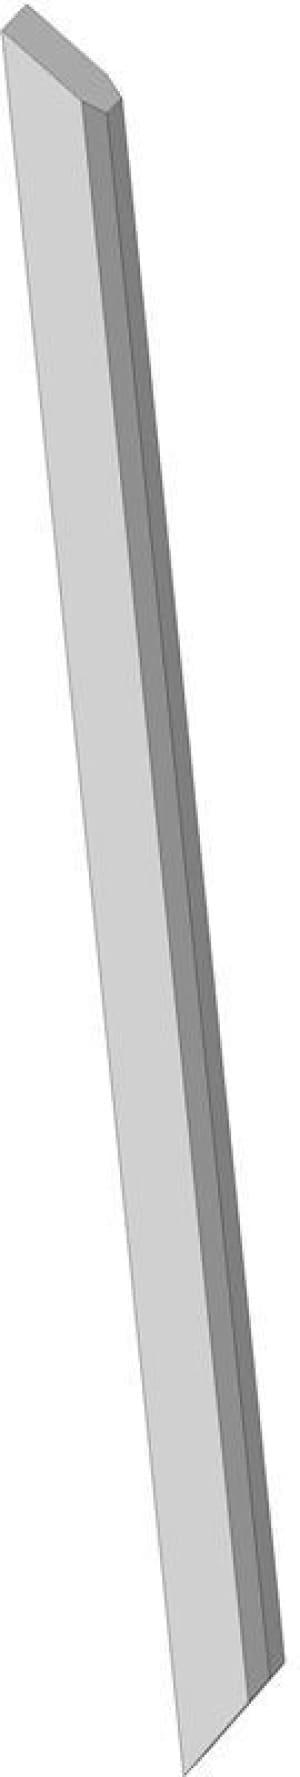 1.Чертеж детали стойка автомобиля грузового ЗИЛ-433440 в 3D формате